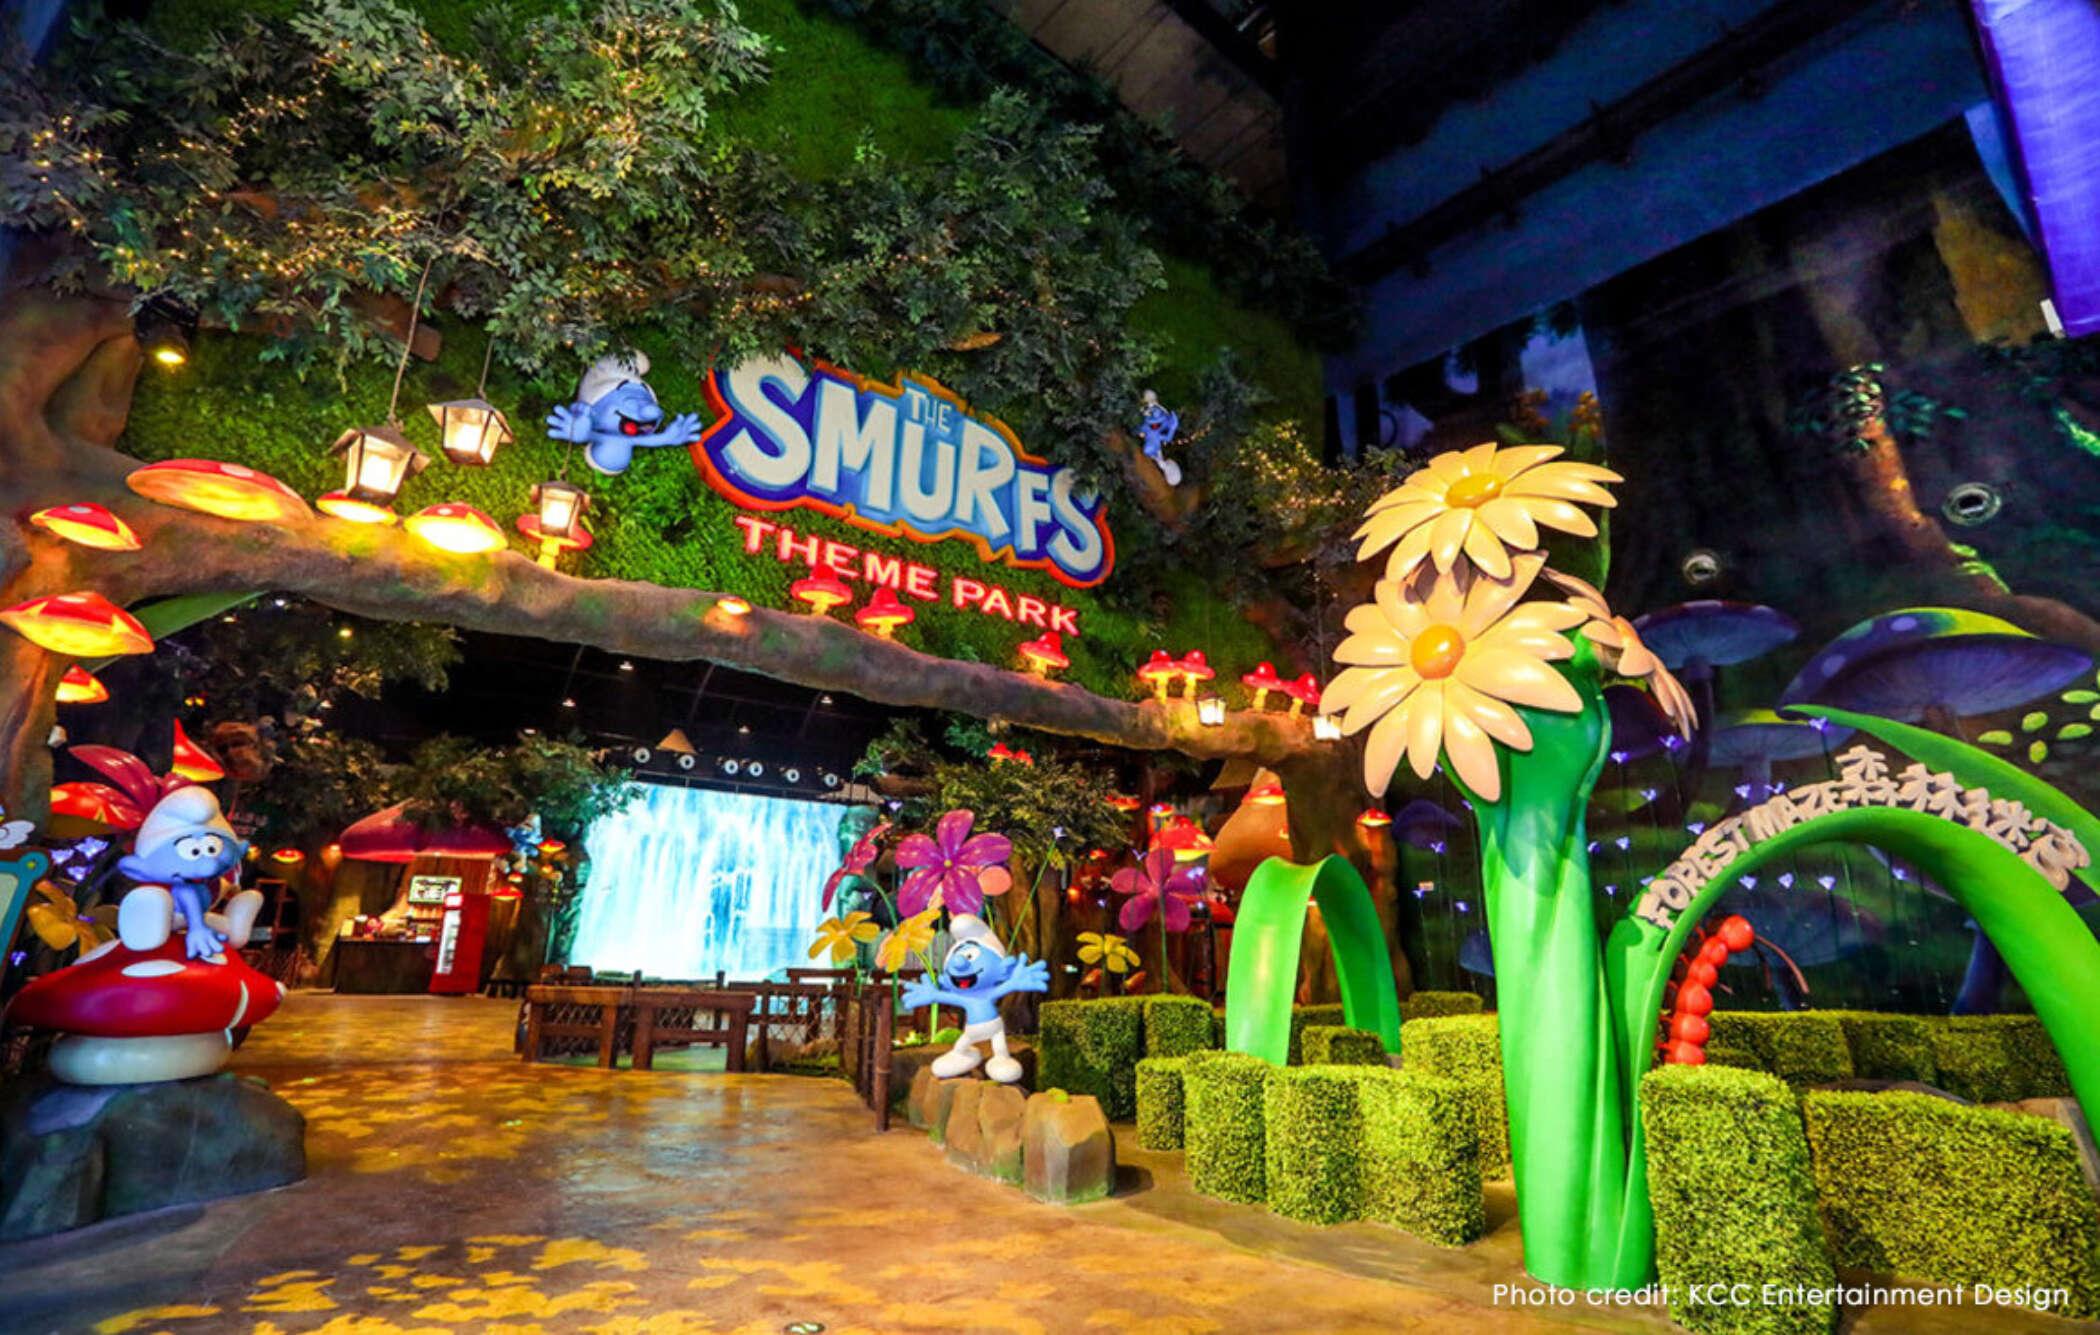 Smurfs Game Changer 6